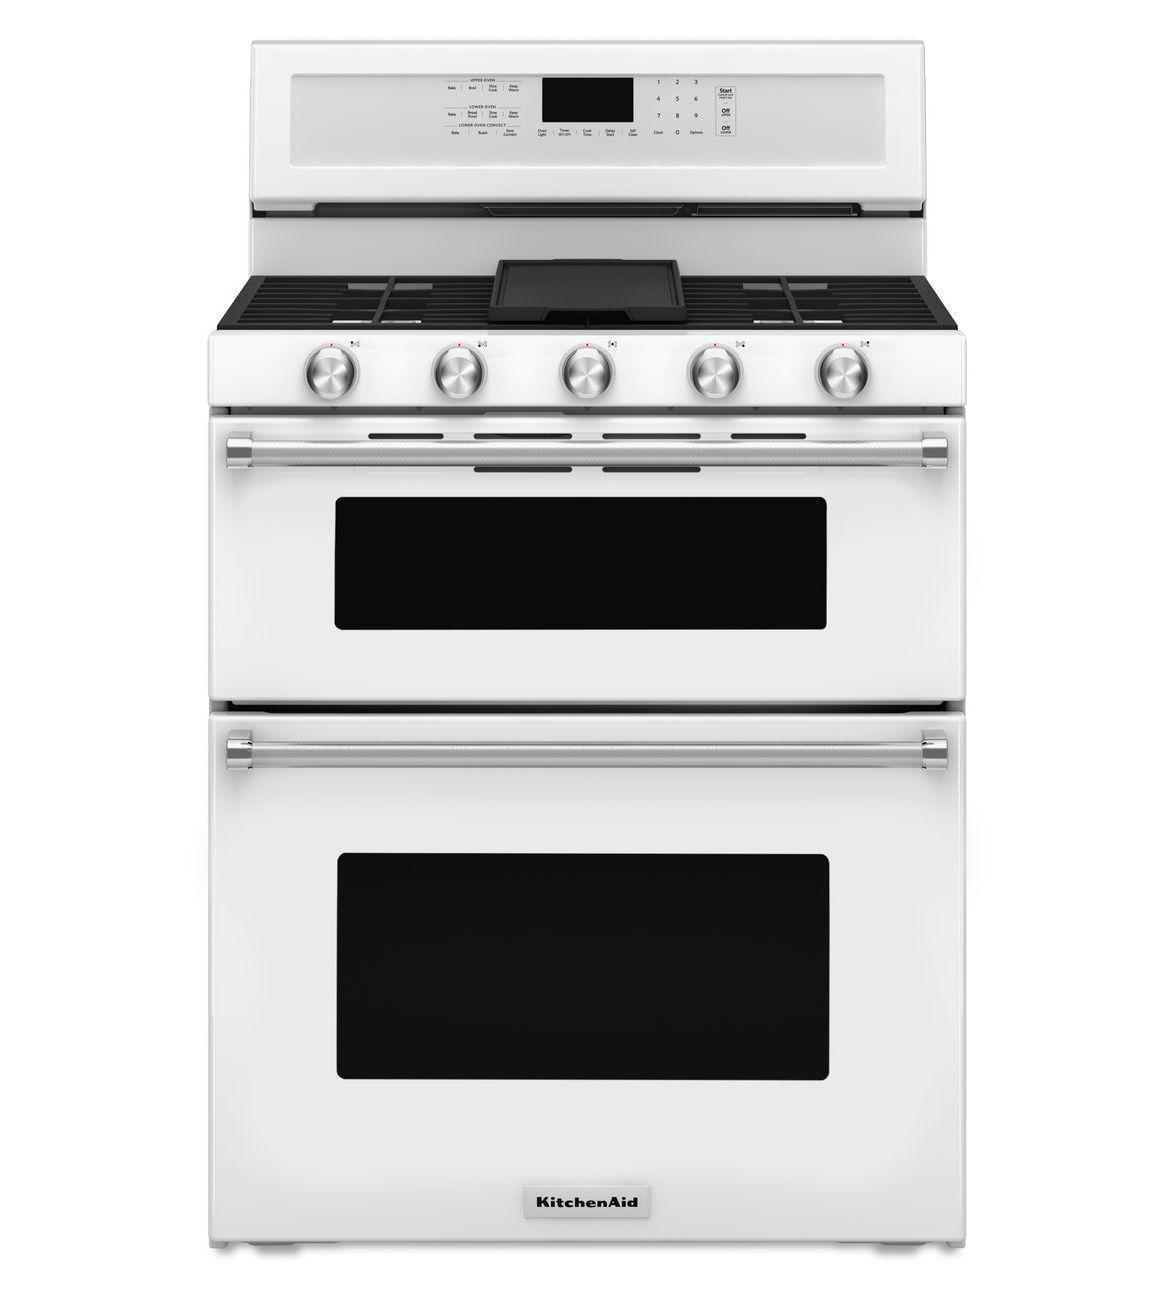 Kitchenaid Gas Double Oven Convection Range KFGD500EWH 30 Inch 5 Burner  White Gas Range